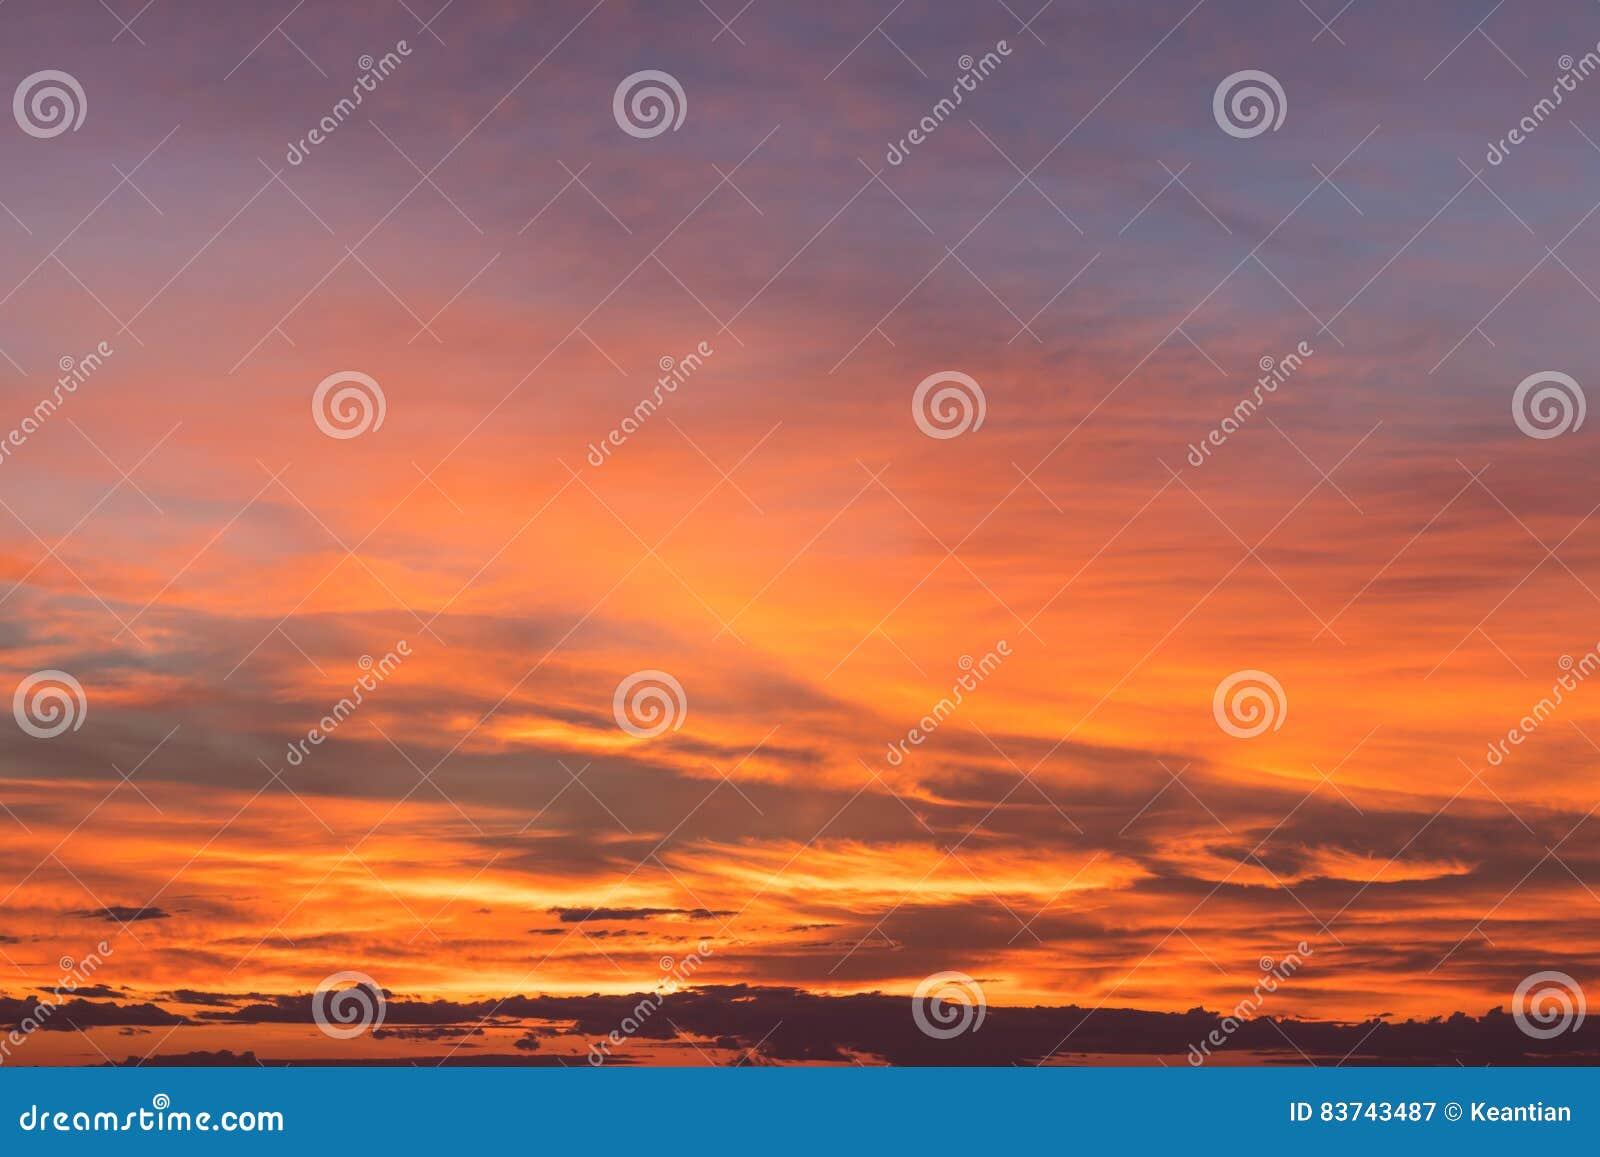 Cloudy sky orange yellow.